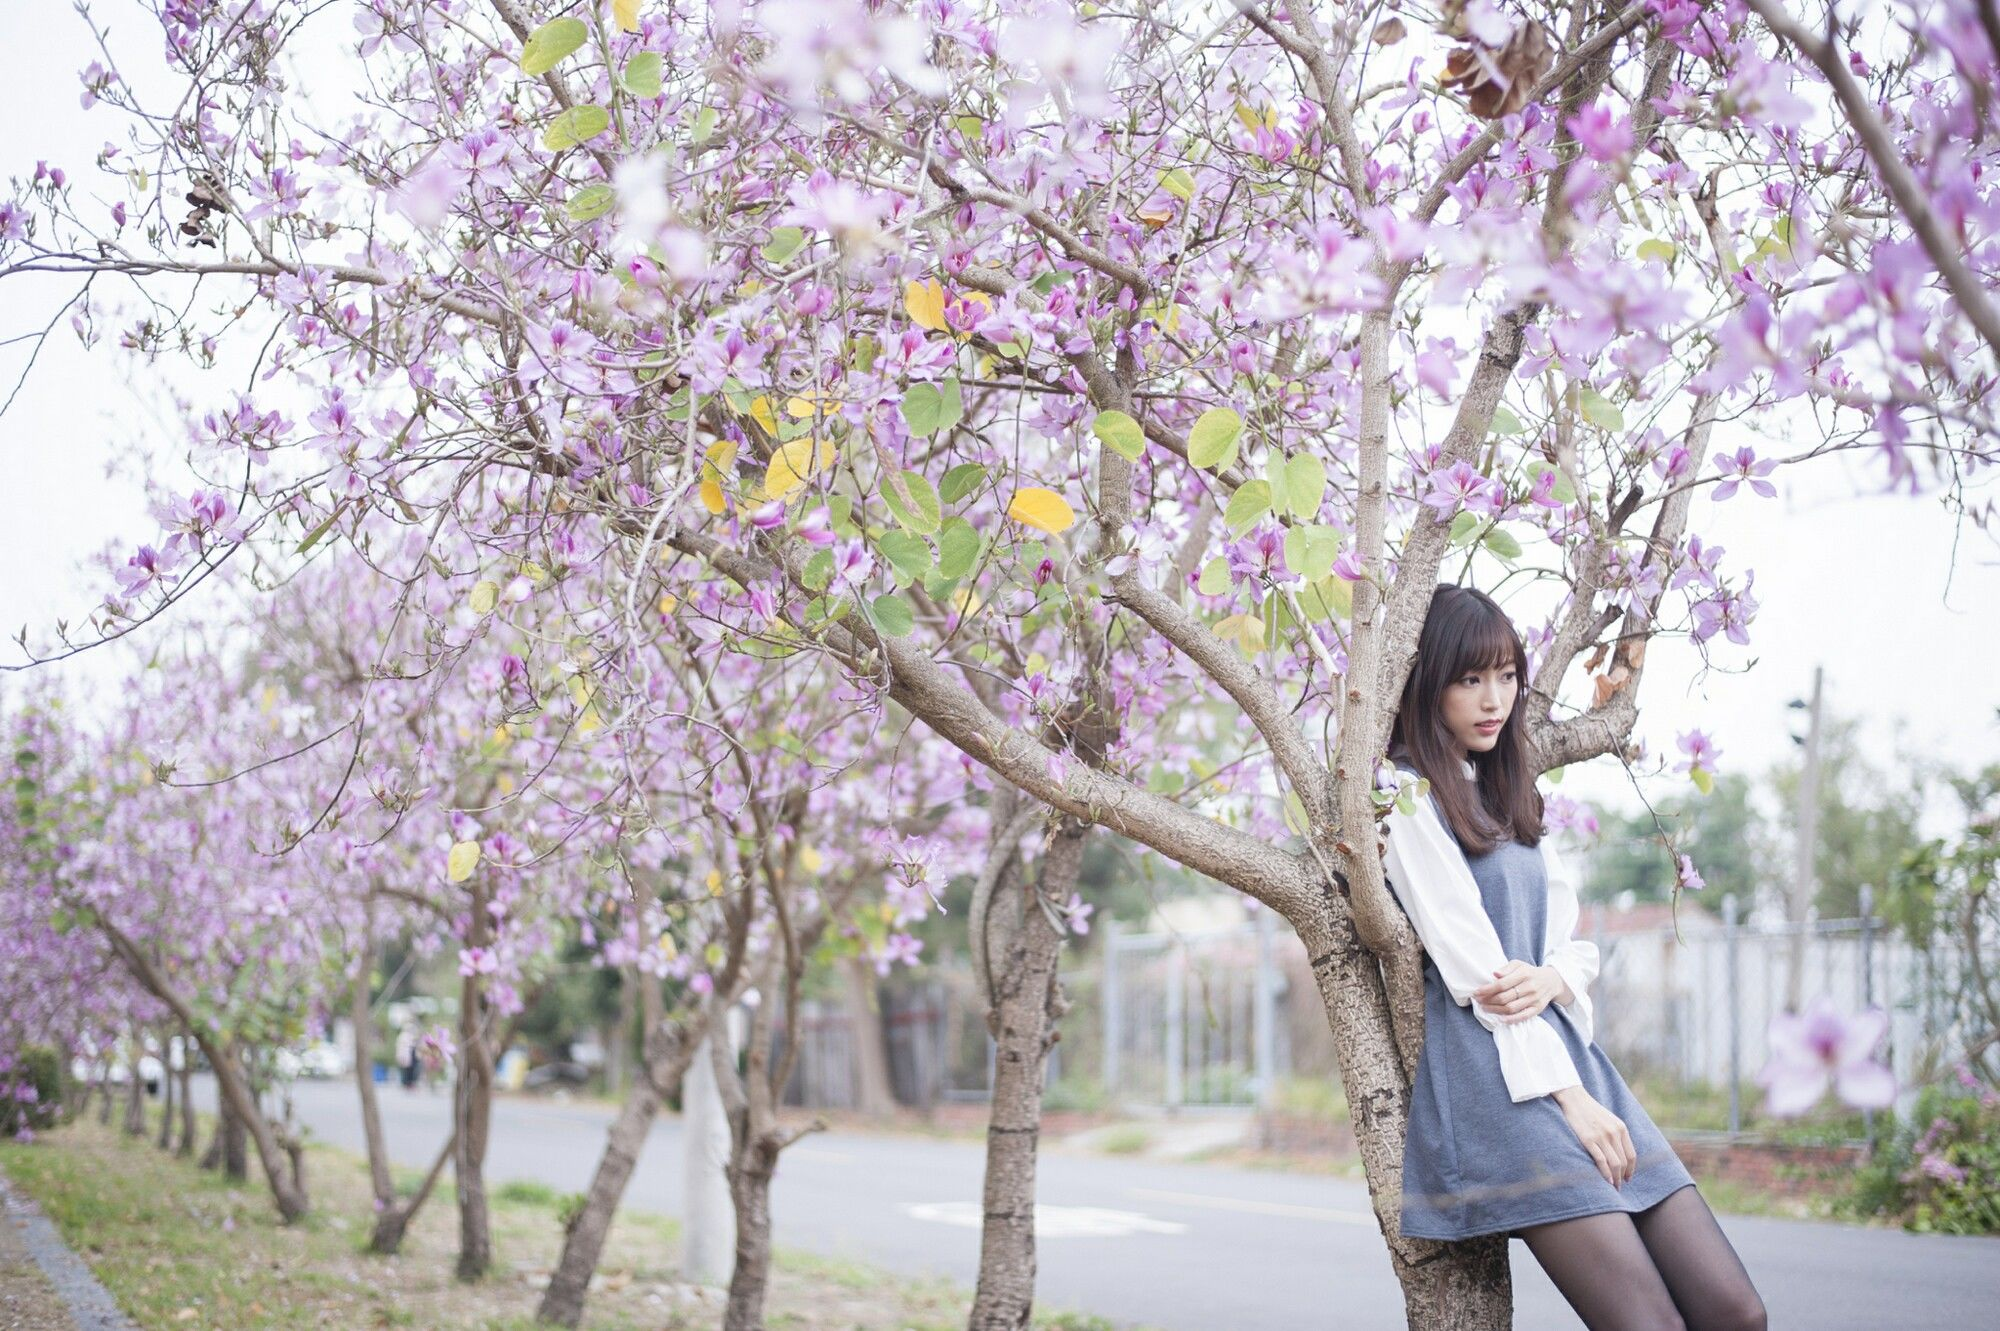 VOL.1551 [台湾正妹]美腿唯美黑丝正妹:彭丽嘉(Lady憶憶)超高清个人性感漂亮大图(33P)